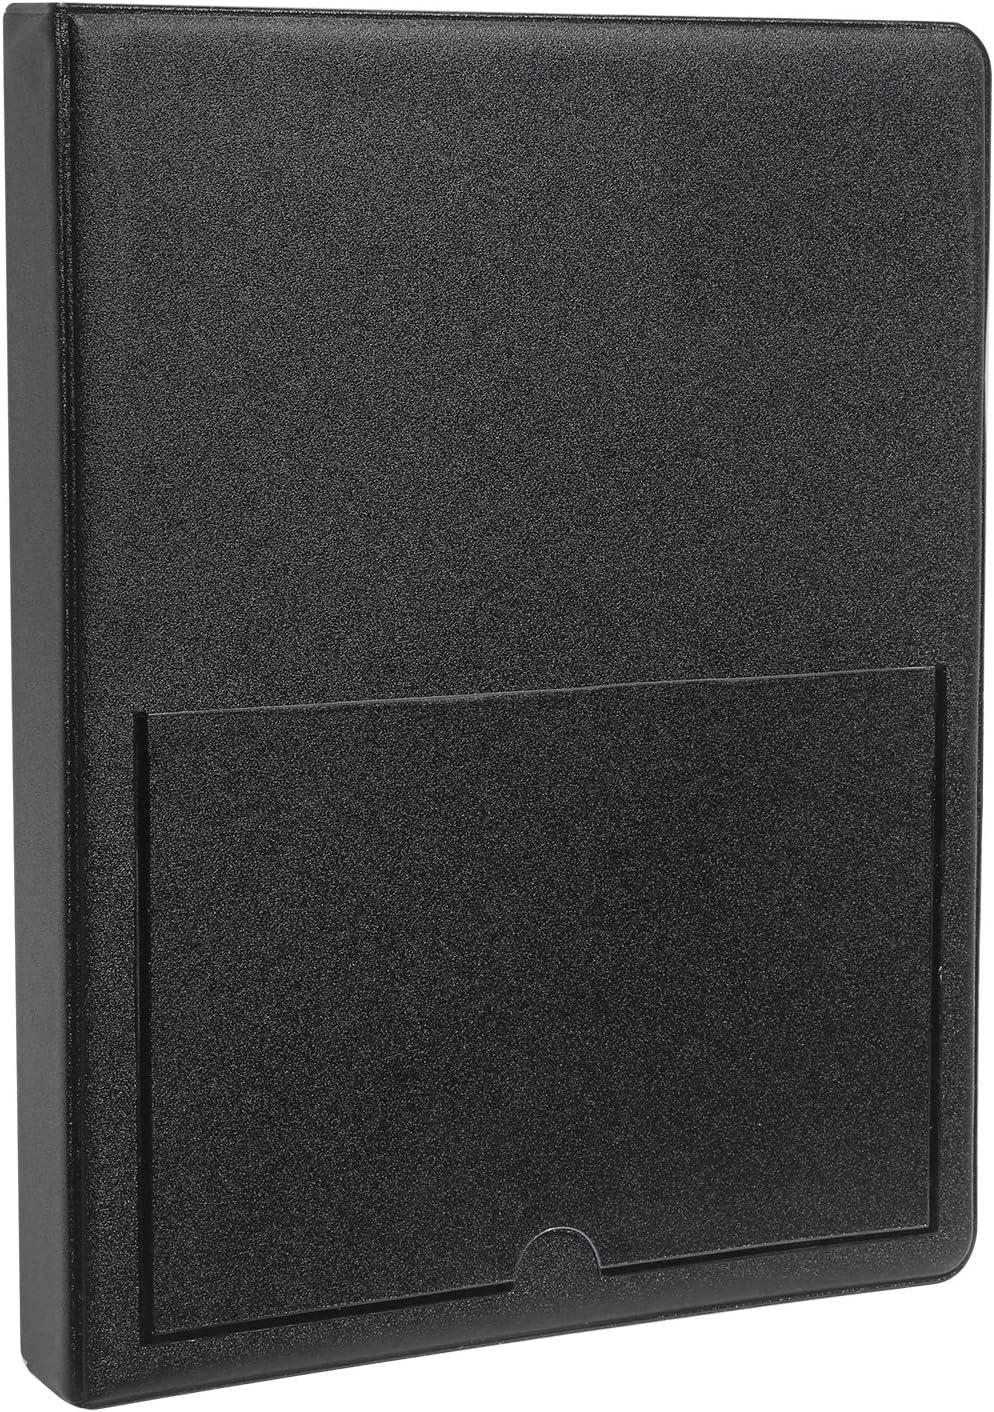 "Zink Photo Album Scrapbook   Sturdy PVC Material Holds 72 - 4x6"" Photos   Compatible with Kodak Dock and HP Sprocket Studio - Black"